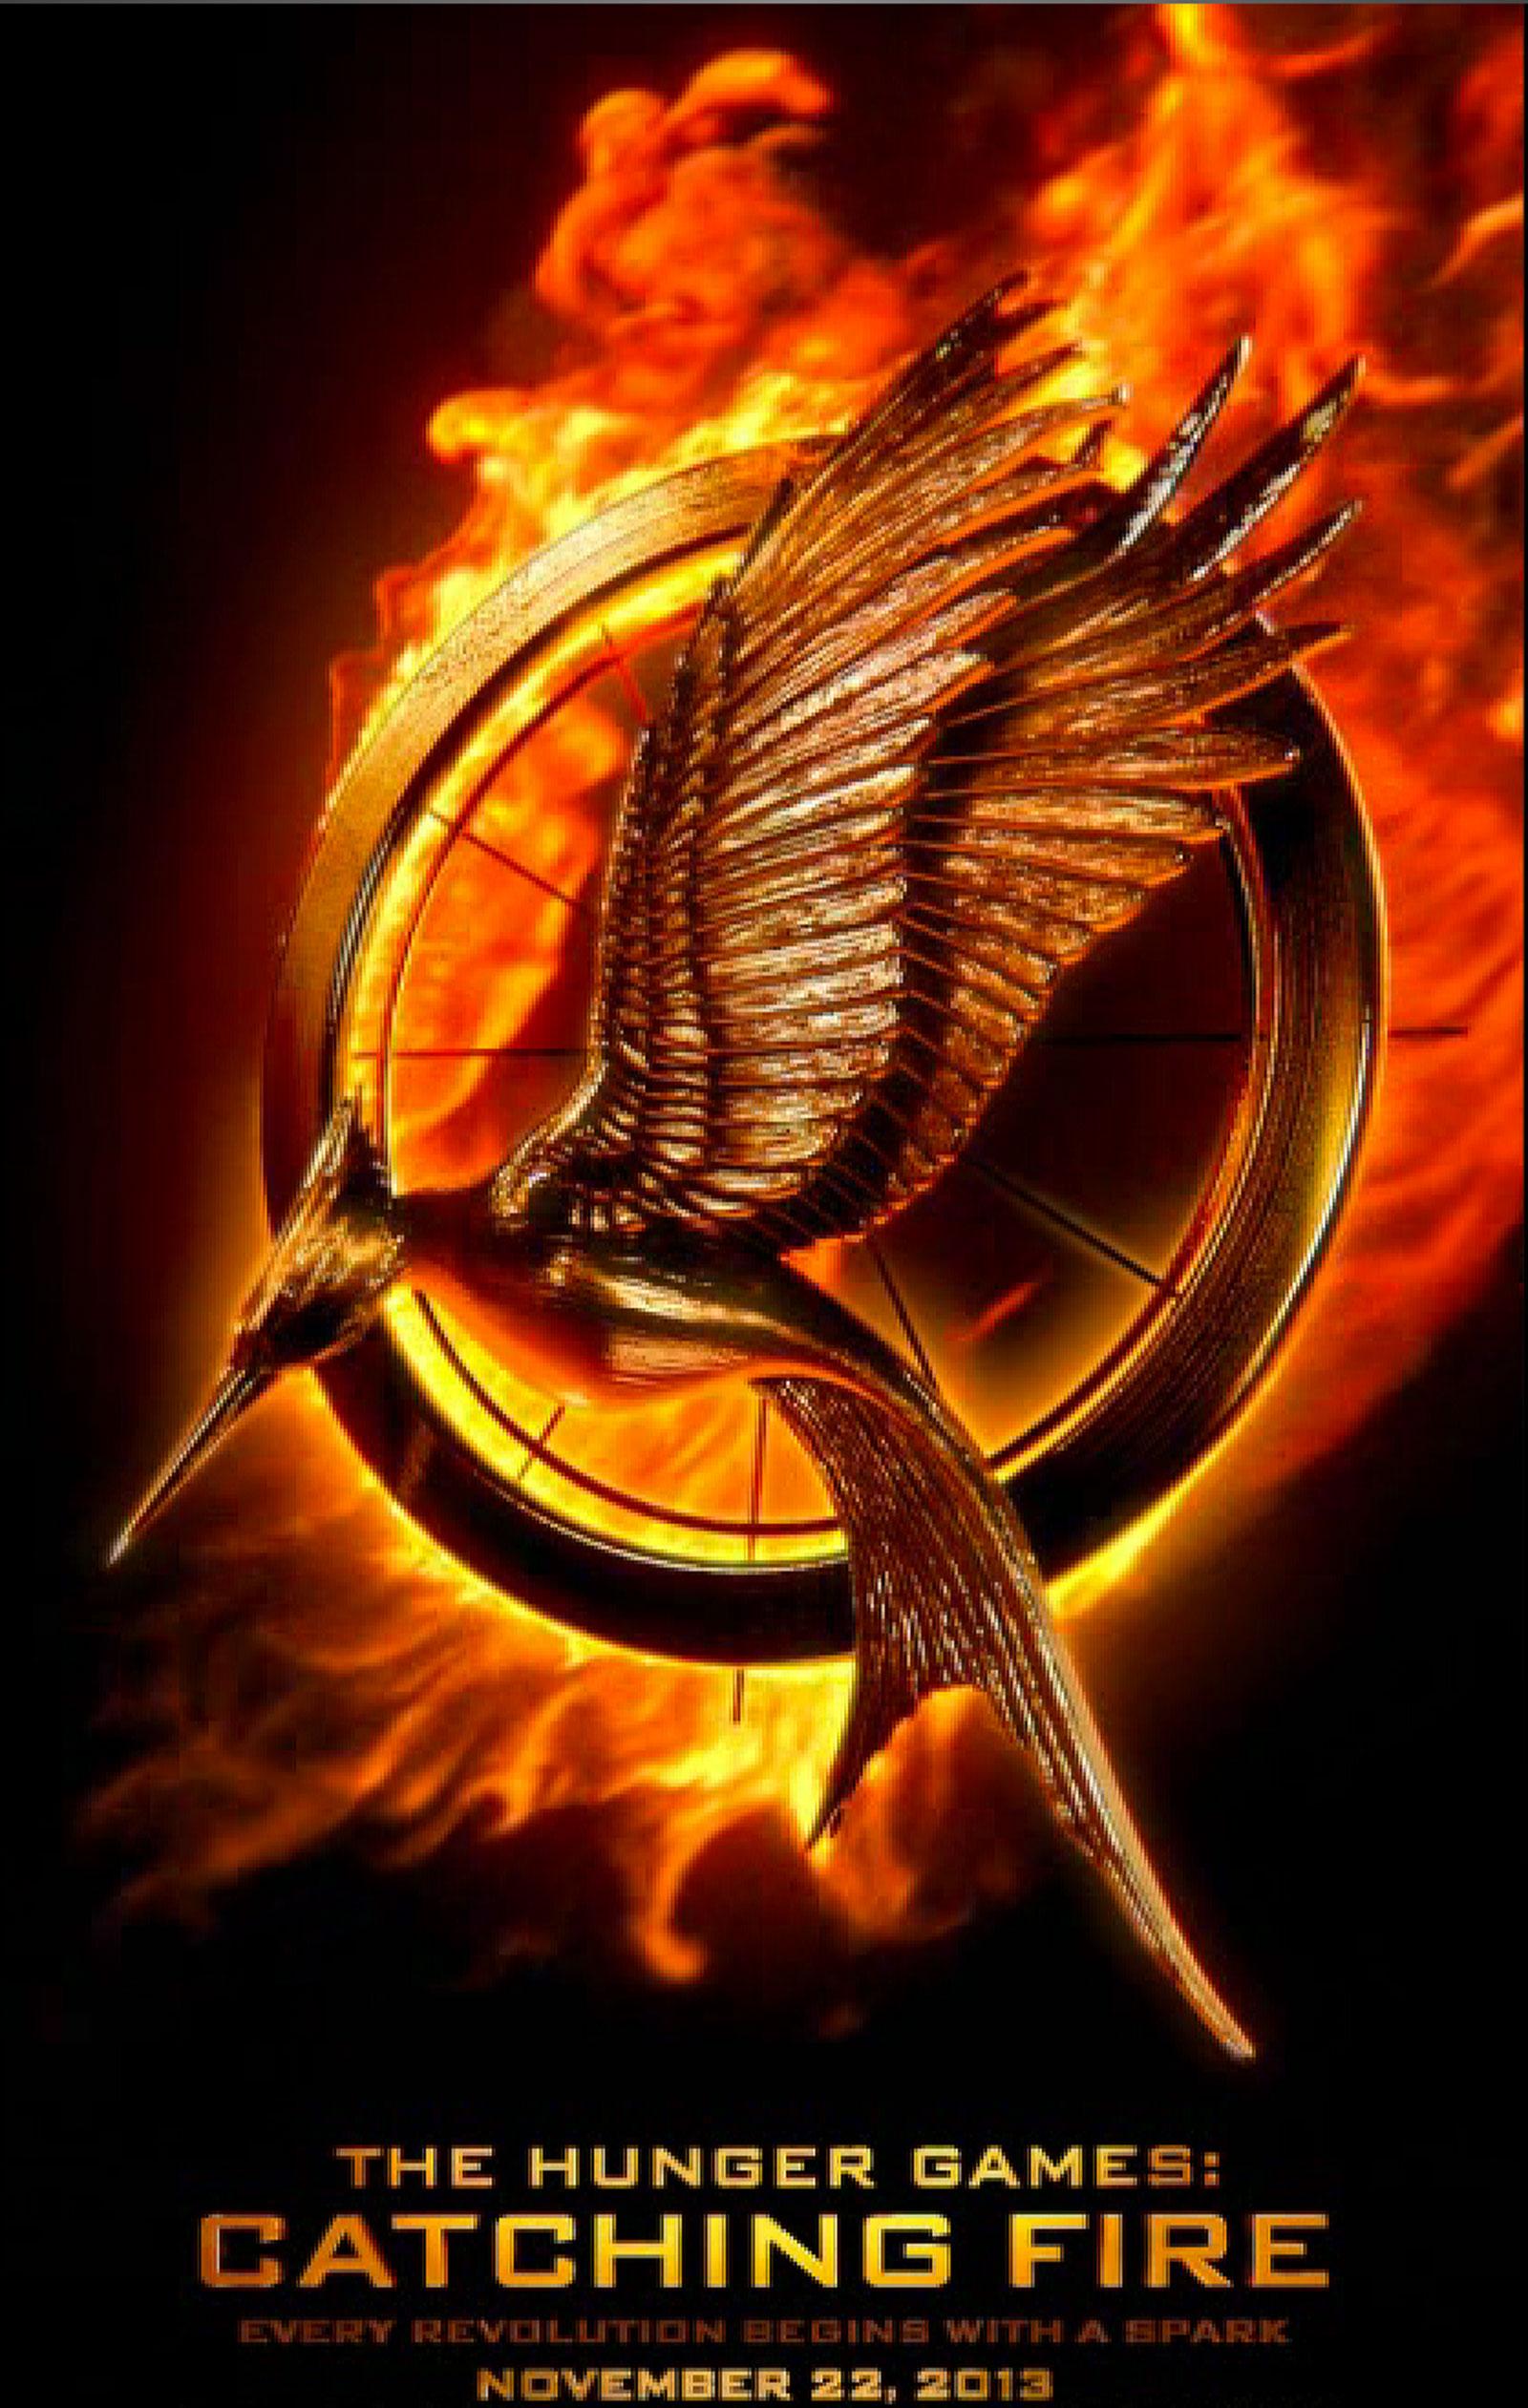 image - catching-fire-movie-poster | moviepedia | fandom powered